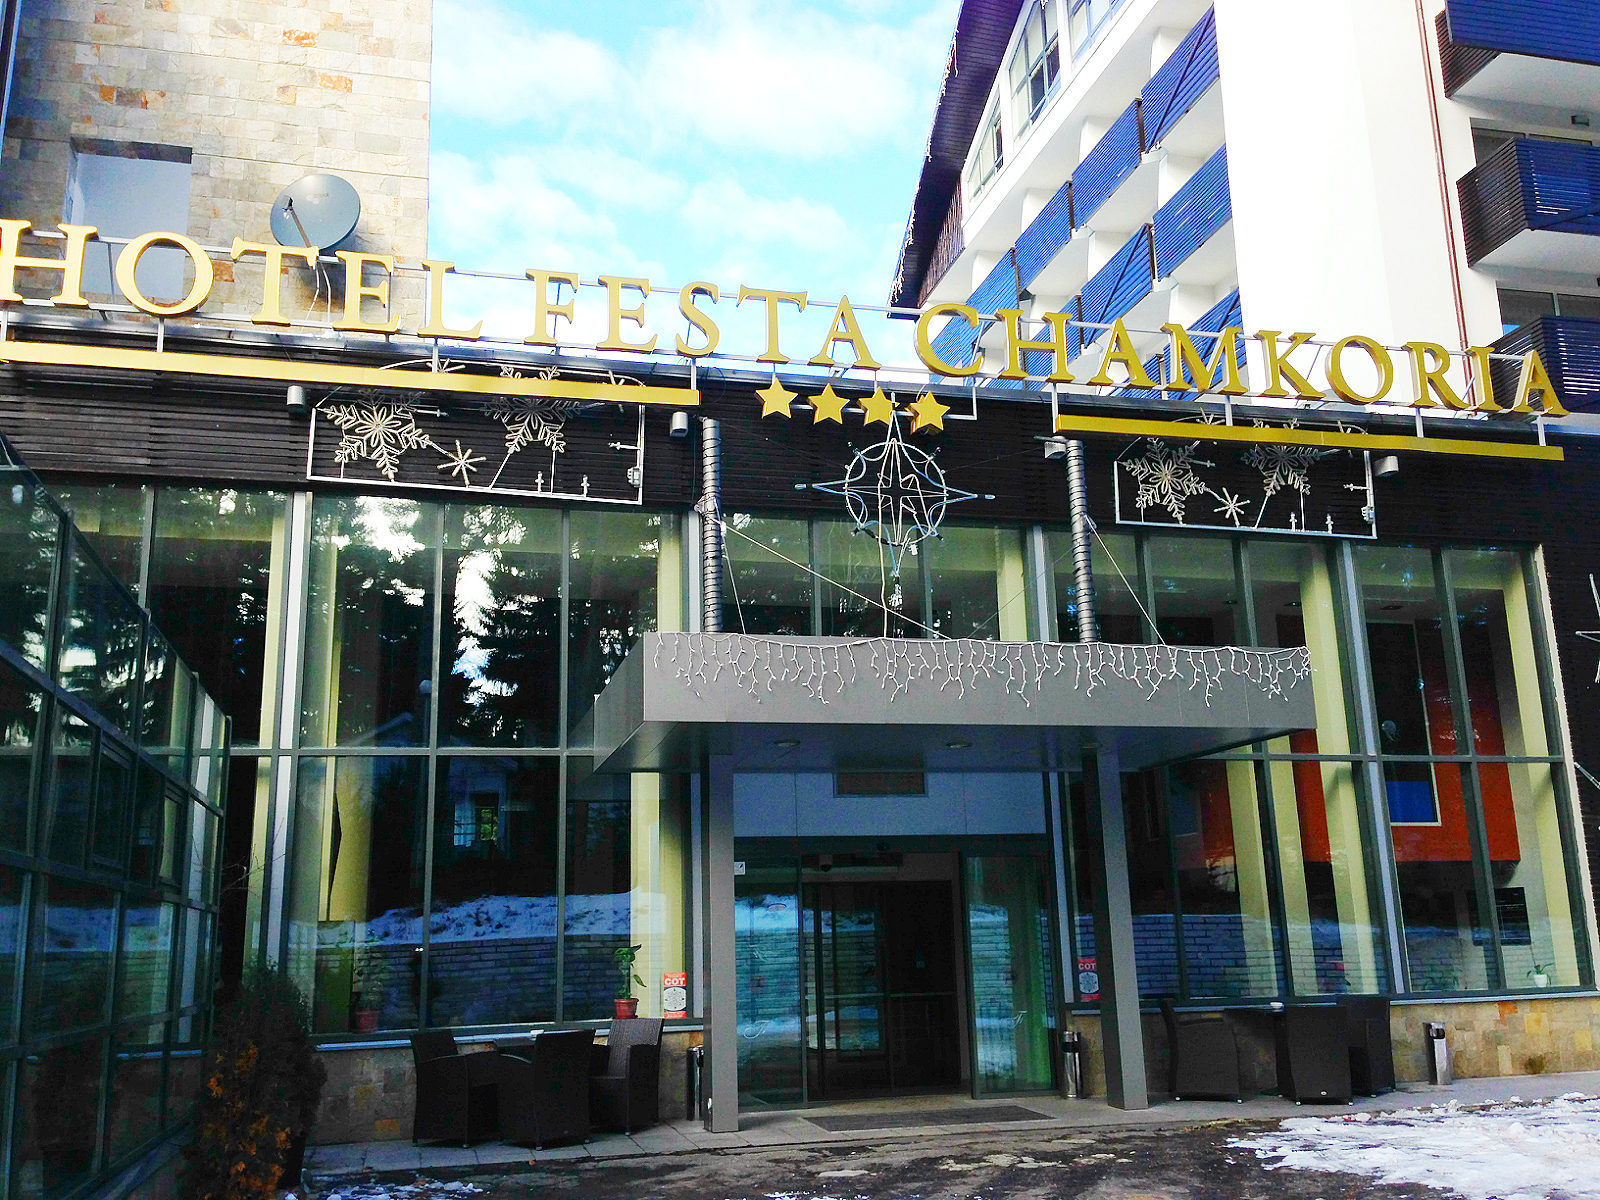 Хотел Феста Чамкория, Боровец